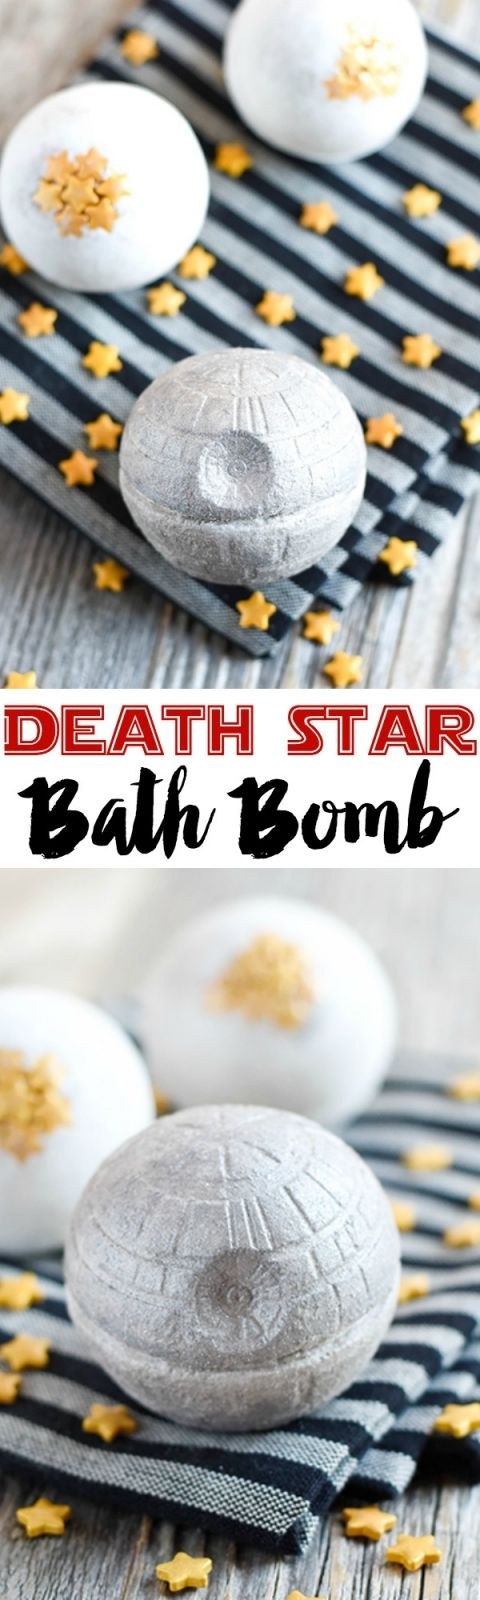 How to make a Star Wars Death Star bath bomb